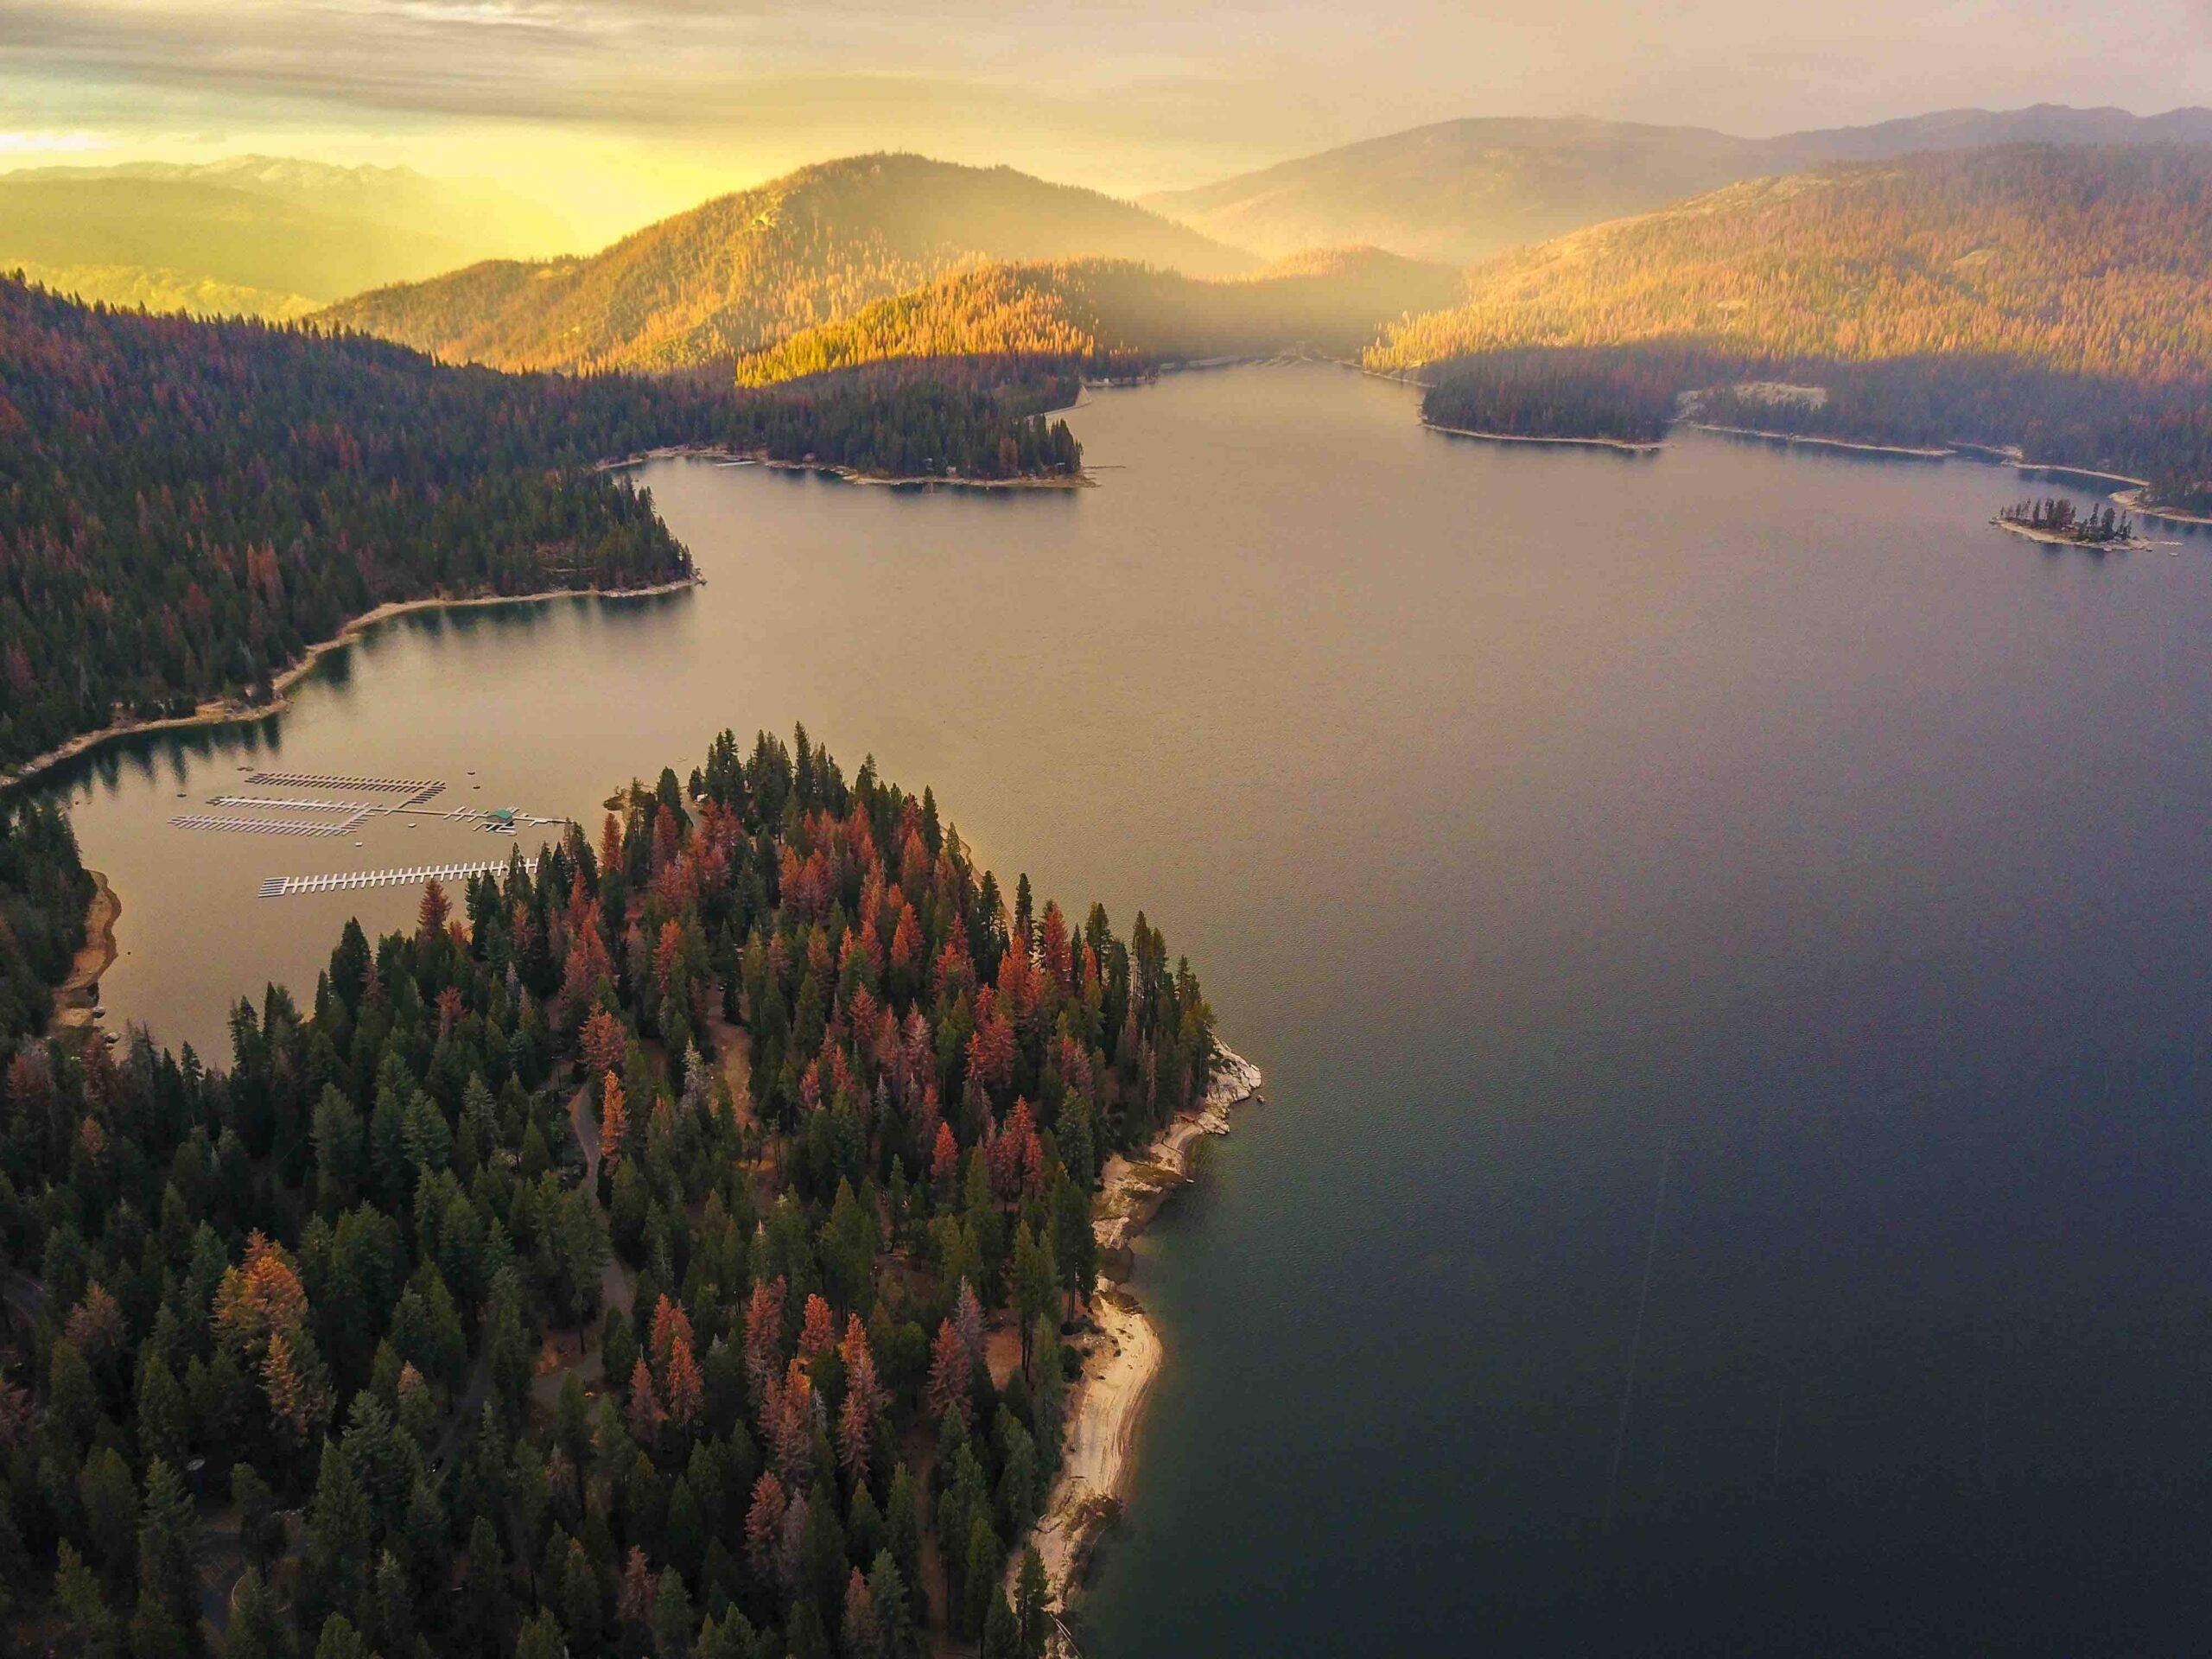 Copy-of-Aerial-View-of-Shaver-Lake_2ae7fe45fccfd850933a4e2ab7ae24b7